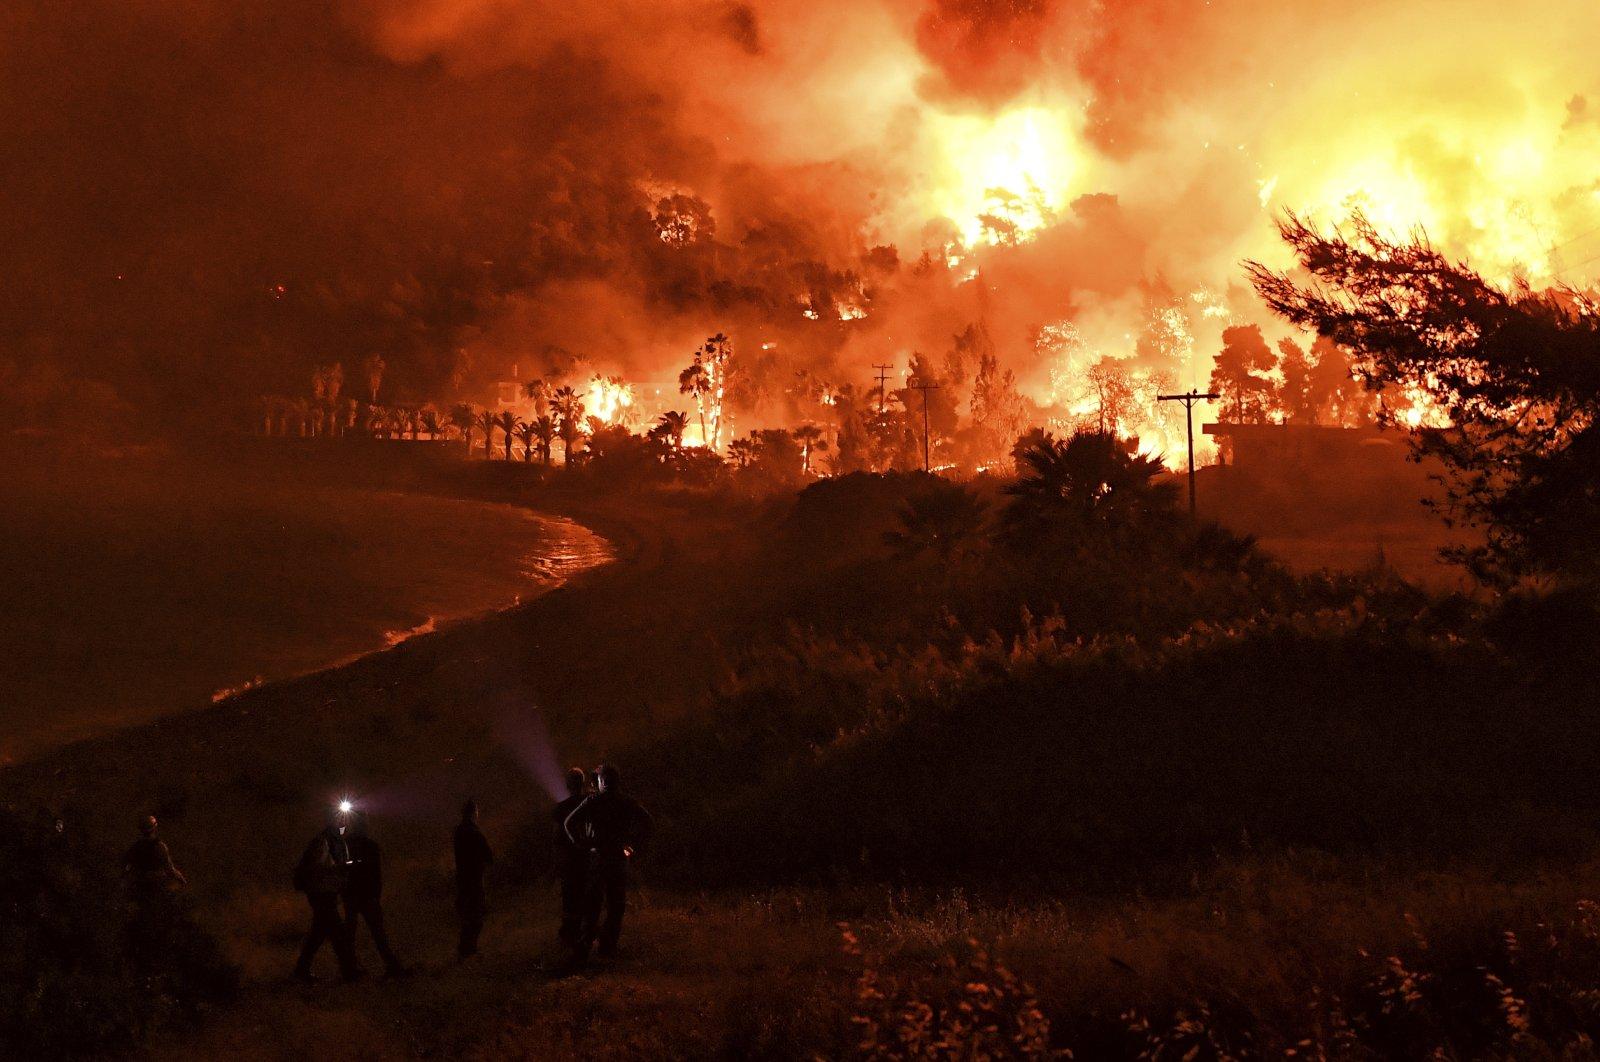 Wildfires burn near the village of Schinos, near Corinth, Greece, May 19, 2021. (AP Photo)